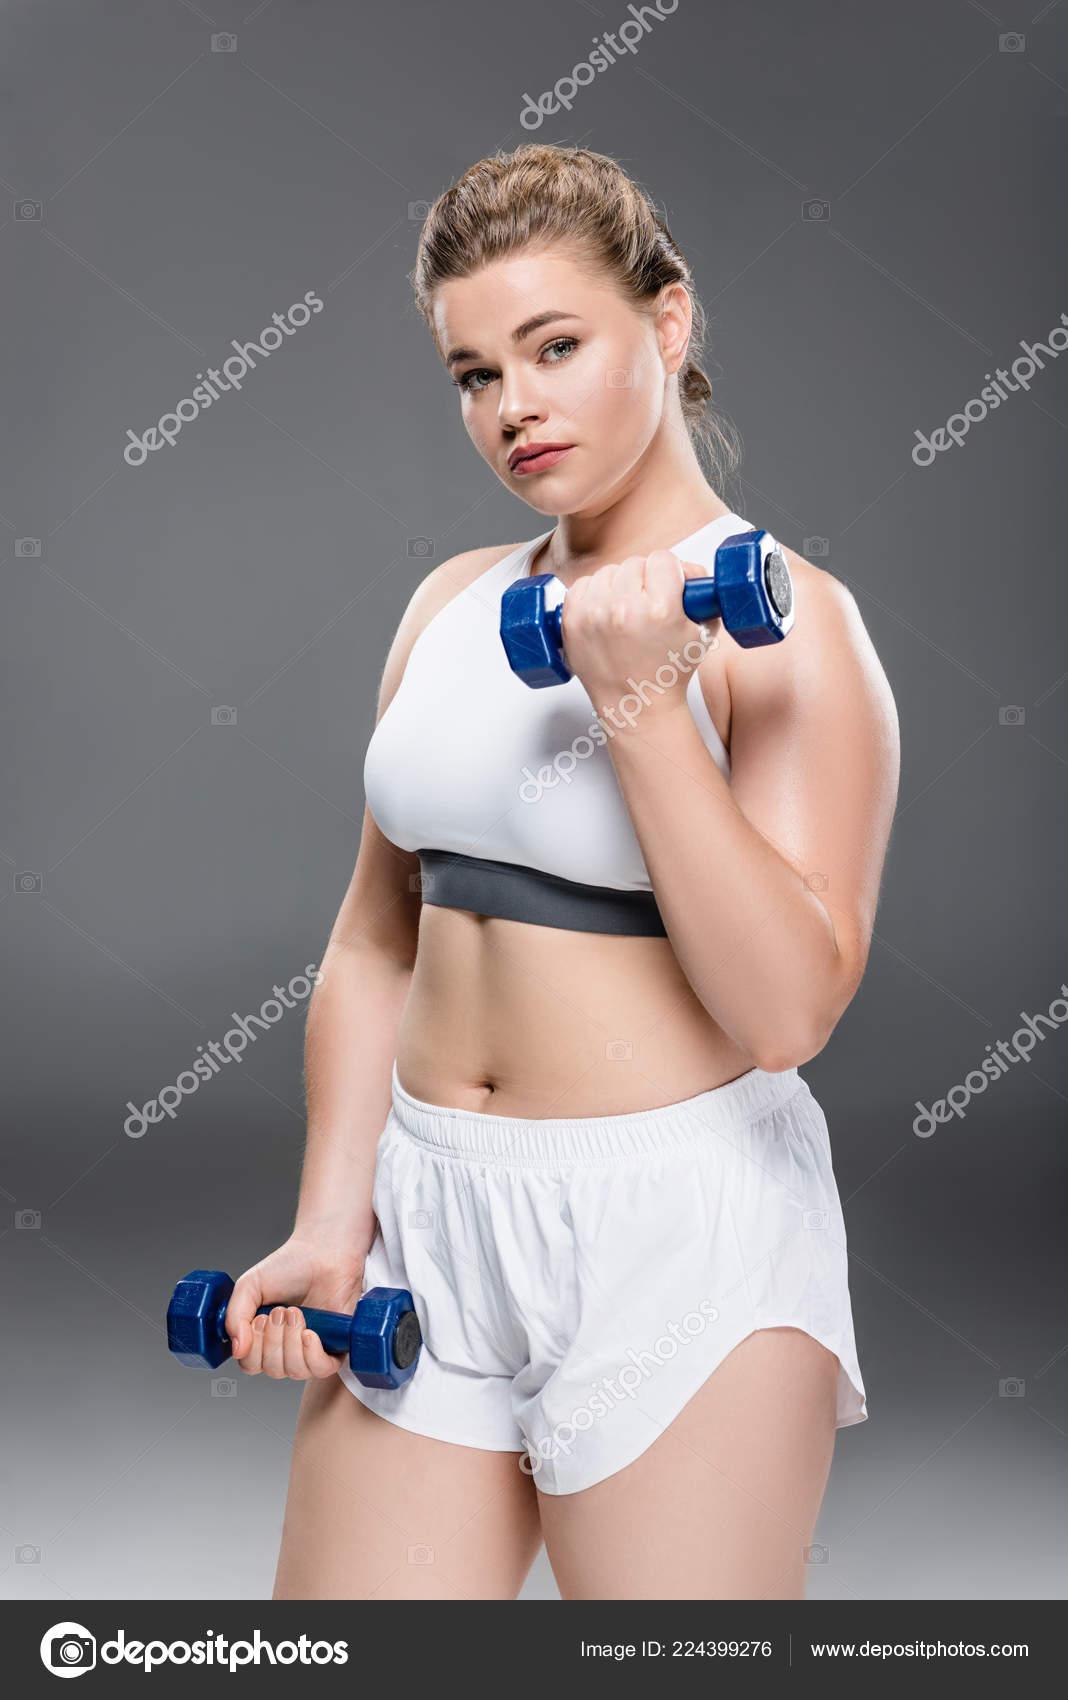 9d575a090dee Νεαρή Γυναίκα Υπέρβαροι Αθλητικά Ρούχα Άσκηση Βαράκια Και Κοιτάζοντας Την — Φωτογραφία  Αρχείου